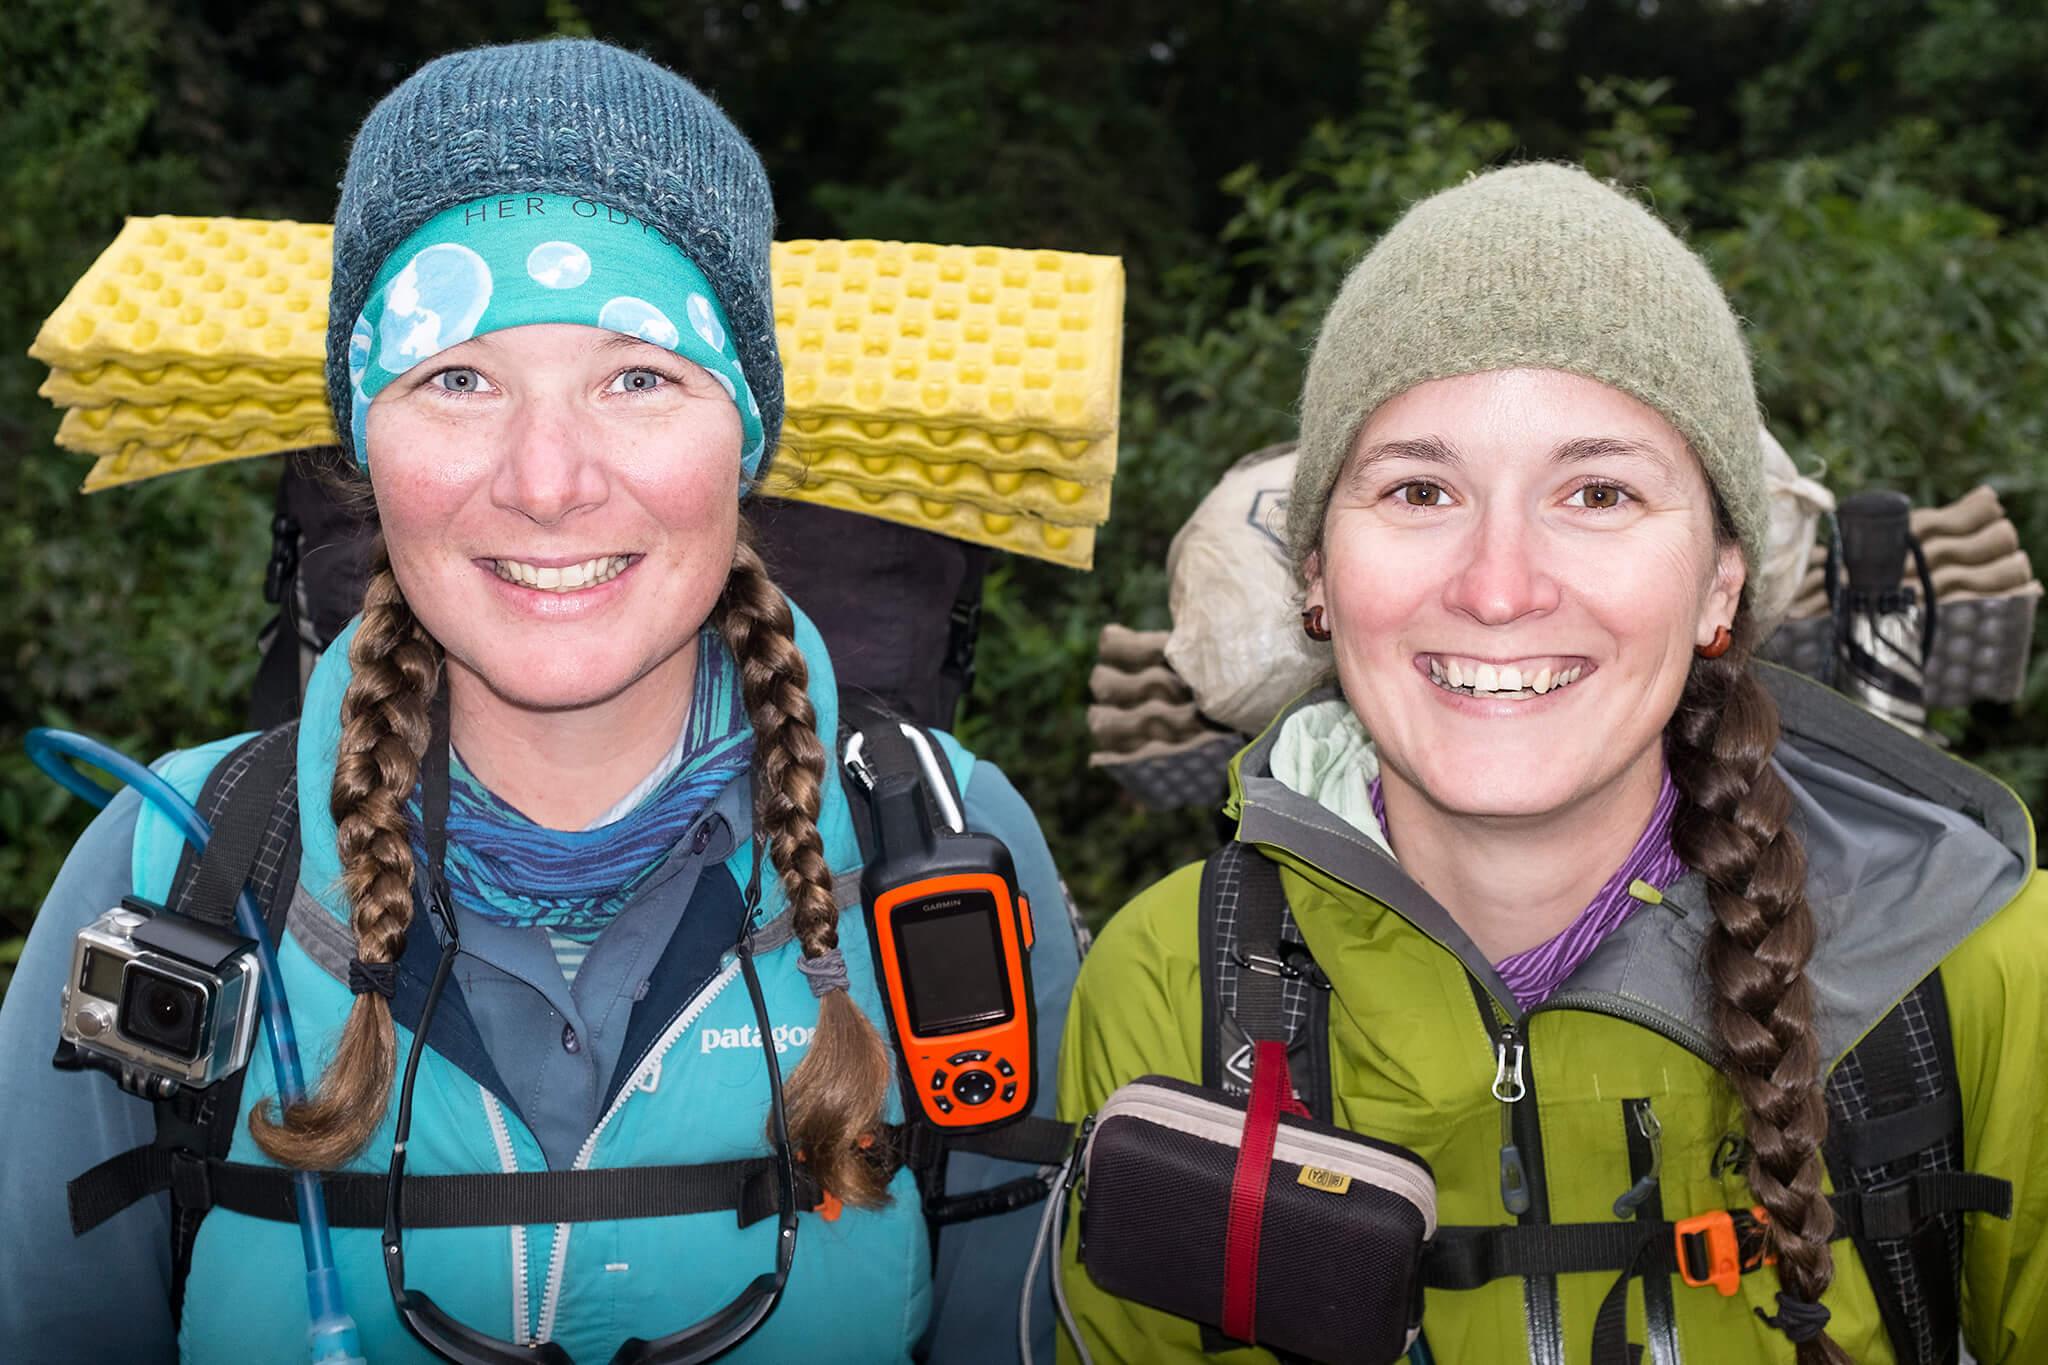 Two women in hiking gear smiling